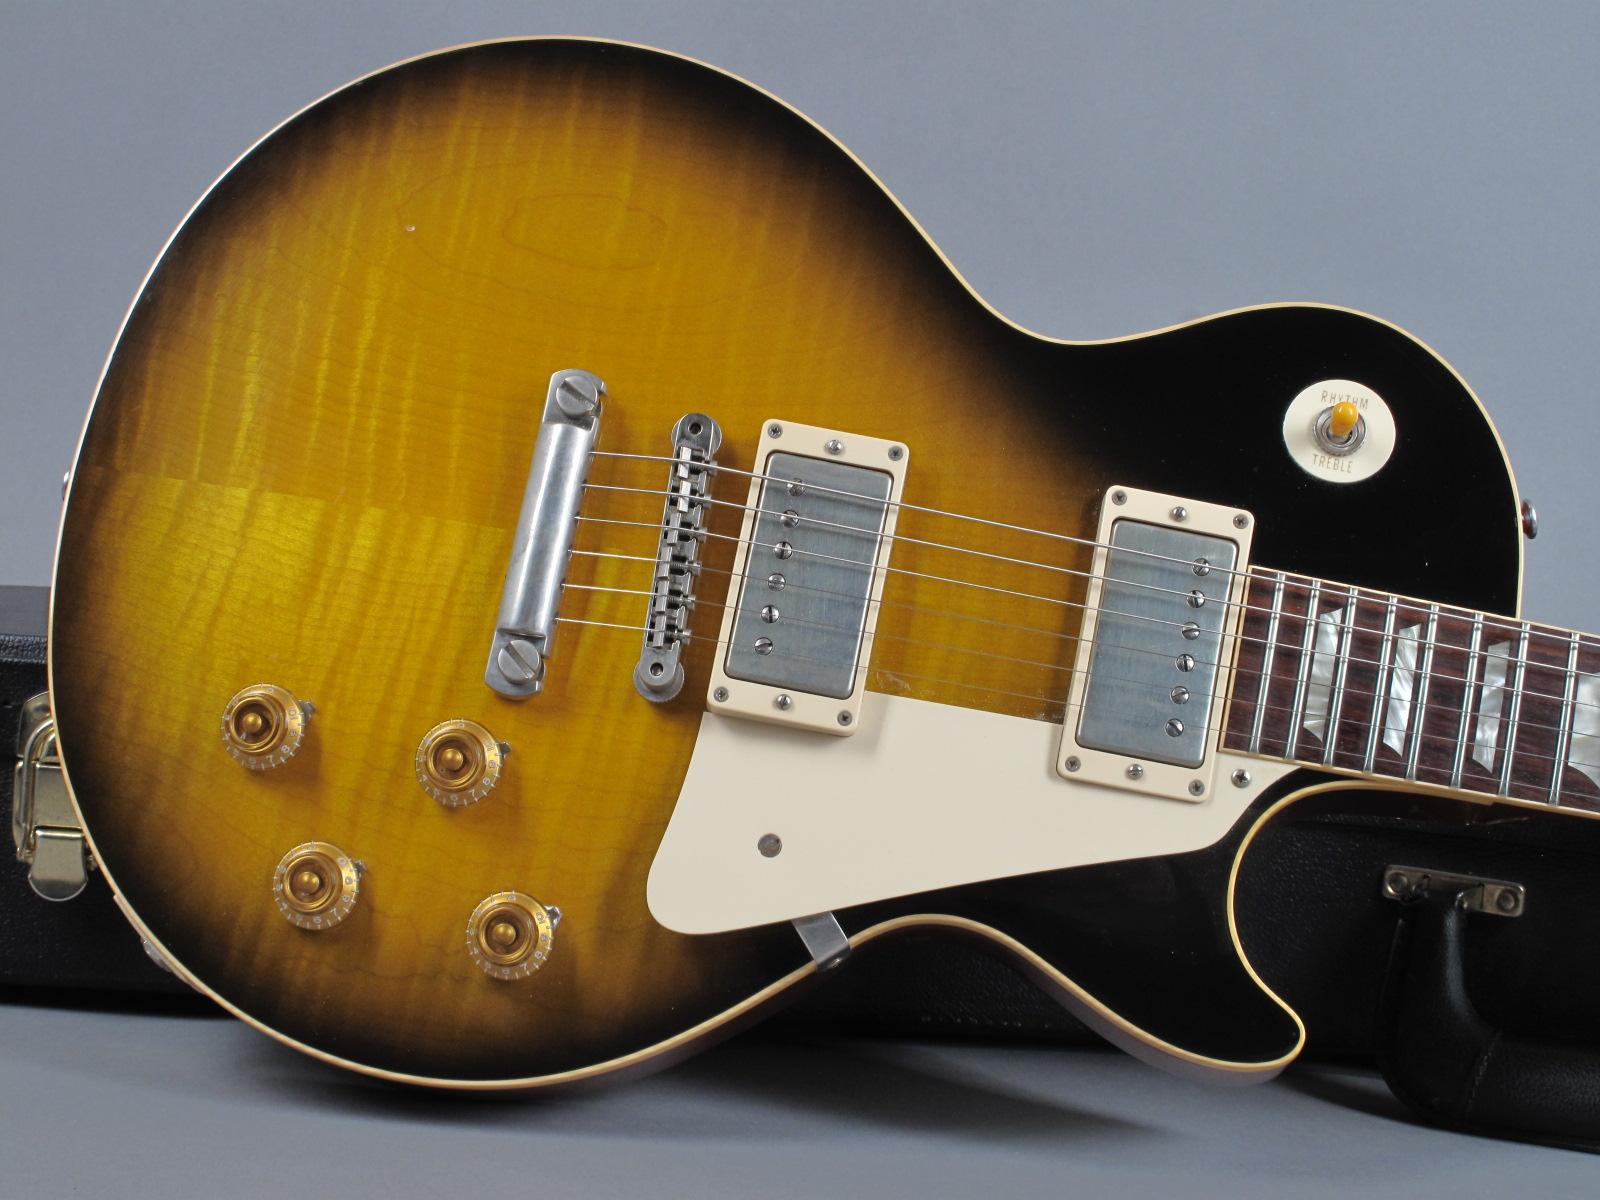 https://guitarpoint.de/app/uploads/products/2010-gibson-les-paul-1960-50th-anniversary-version-1-tobacco-burst/Gibson_Les_Paul_1960_Reissue_50th_Anniversary_00067_11.jpg